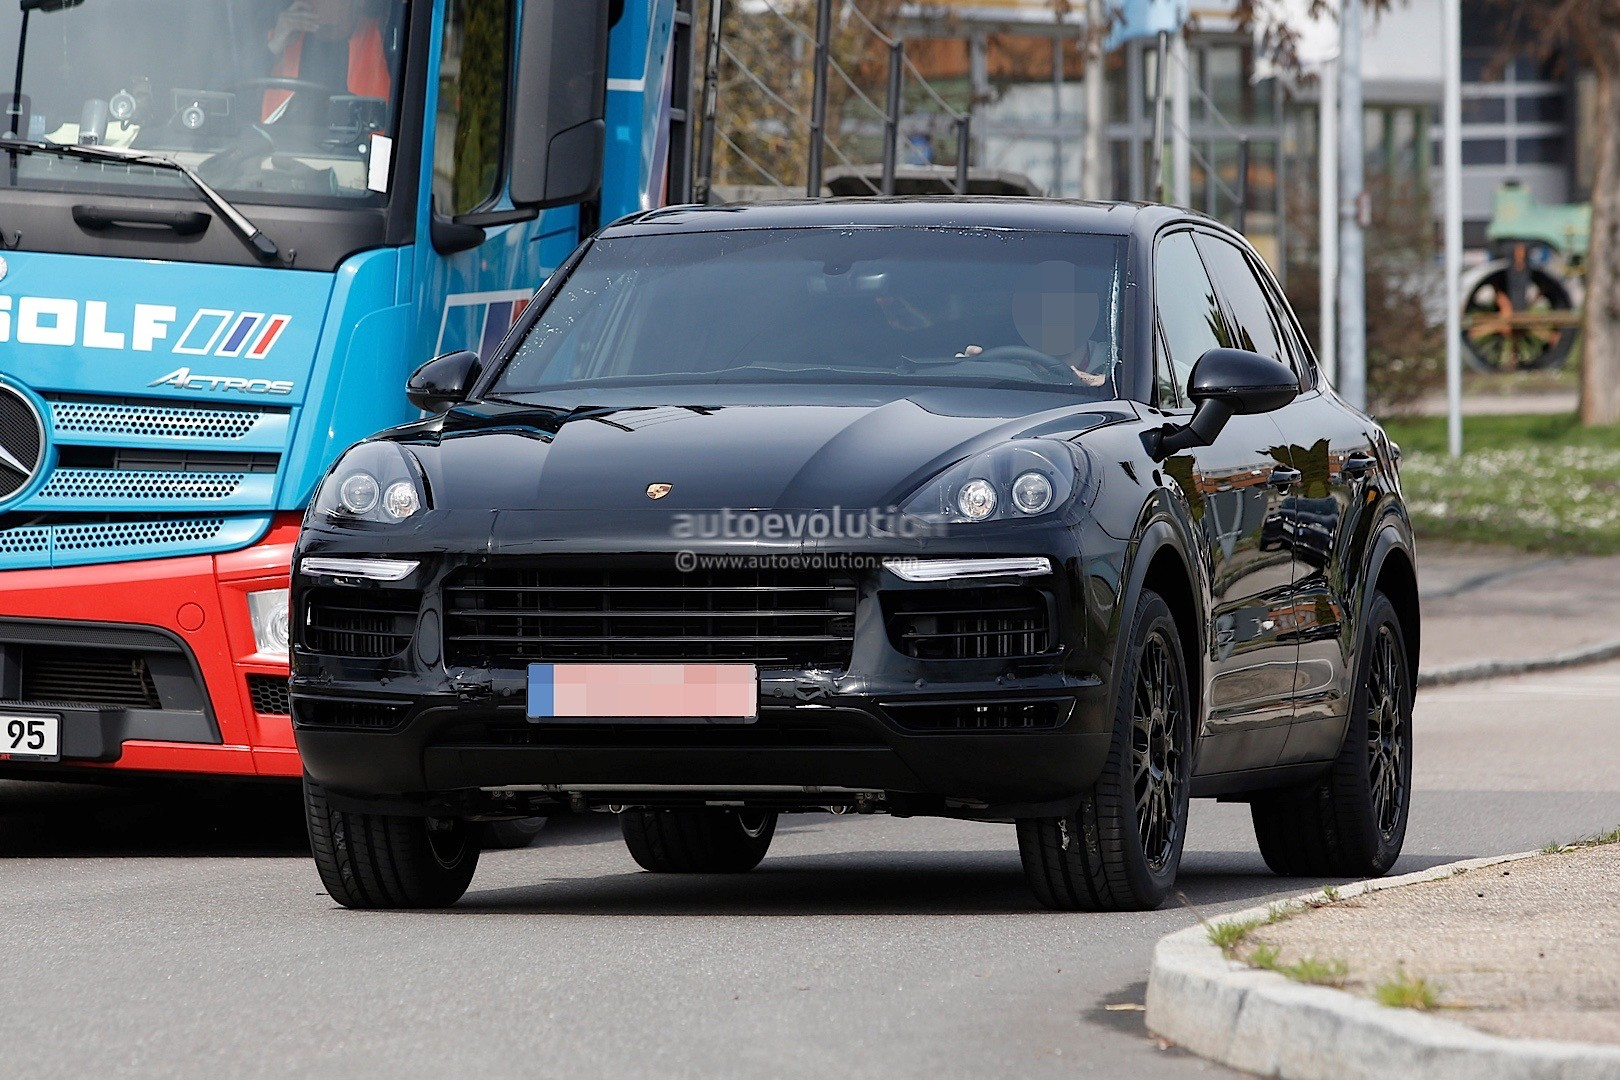 2016 Porsche Panamera Gts >> 2018 Porsche Cayenne Test Mule Spied in Germany ...